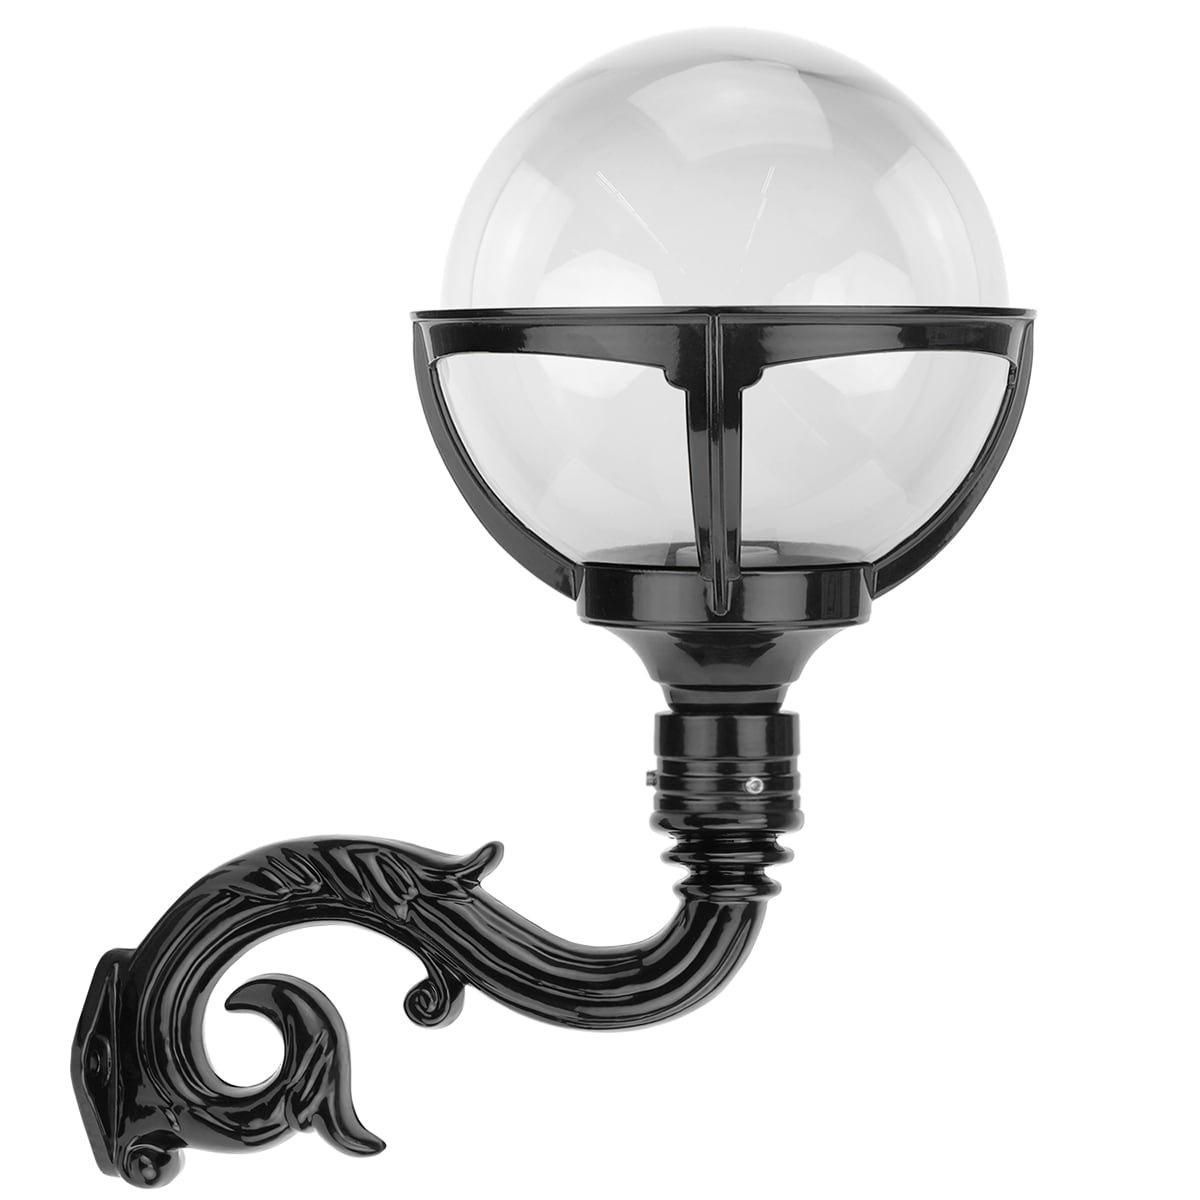 Outdoor Lamps Retro Rustic Globe lamp wall curl arm Haskerhorne - 47 cm